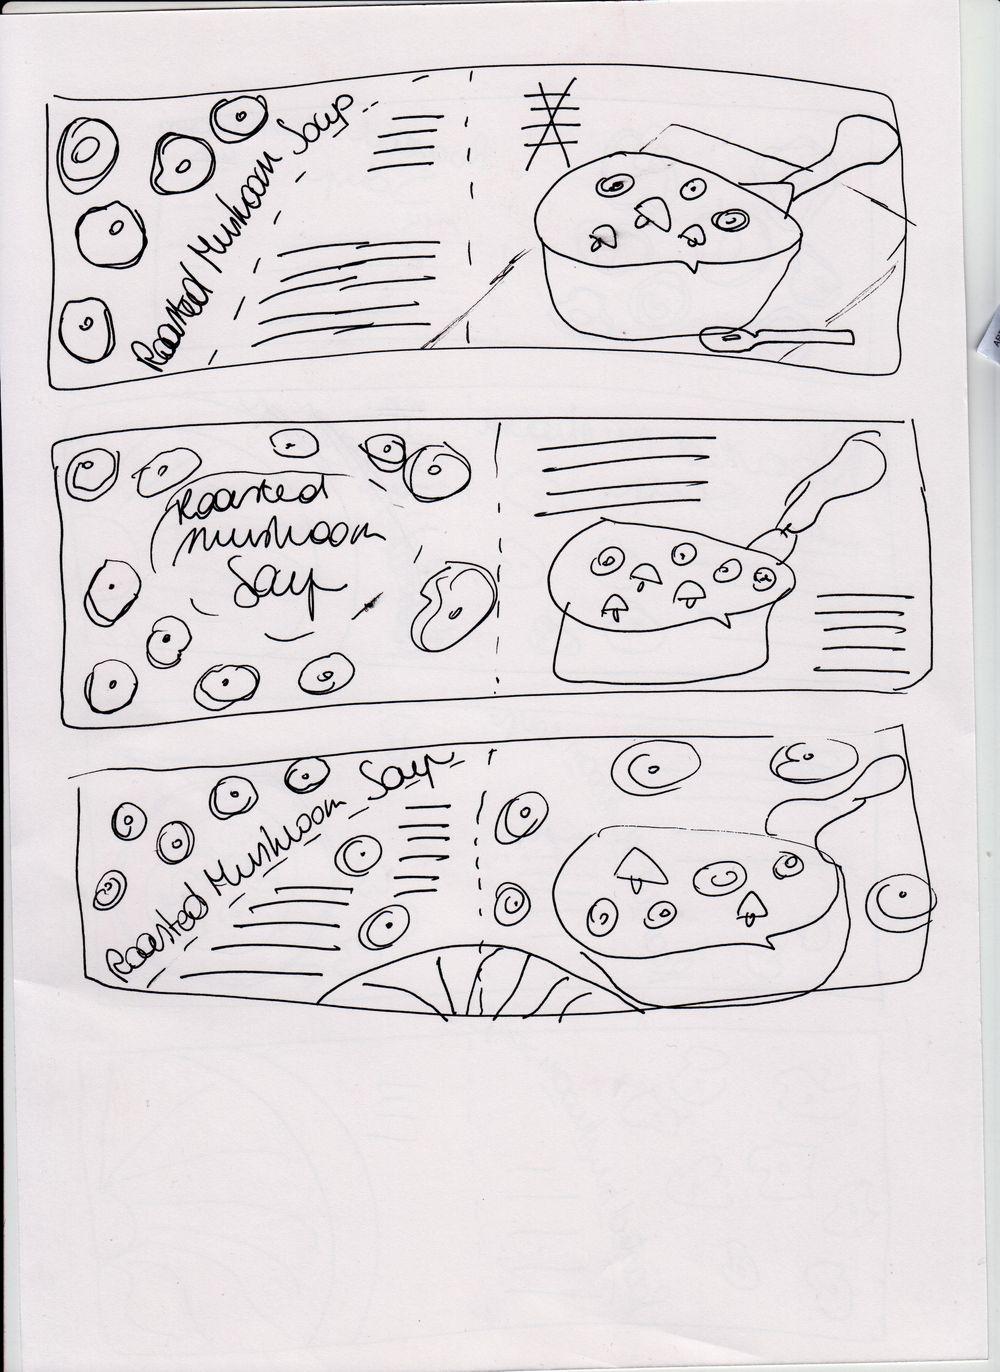 Roasted Mushroom Soup - image 2 - student project